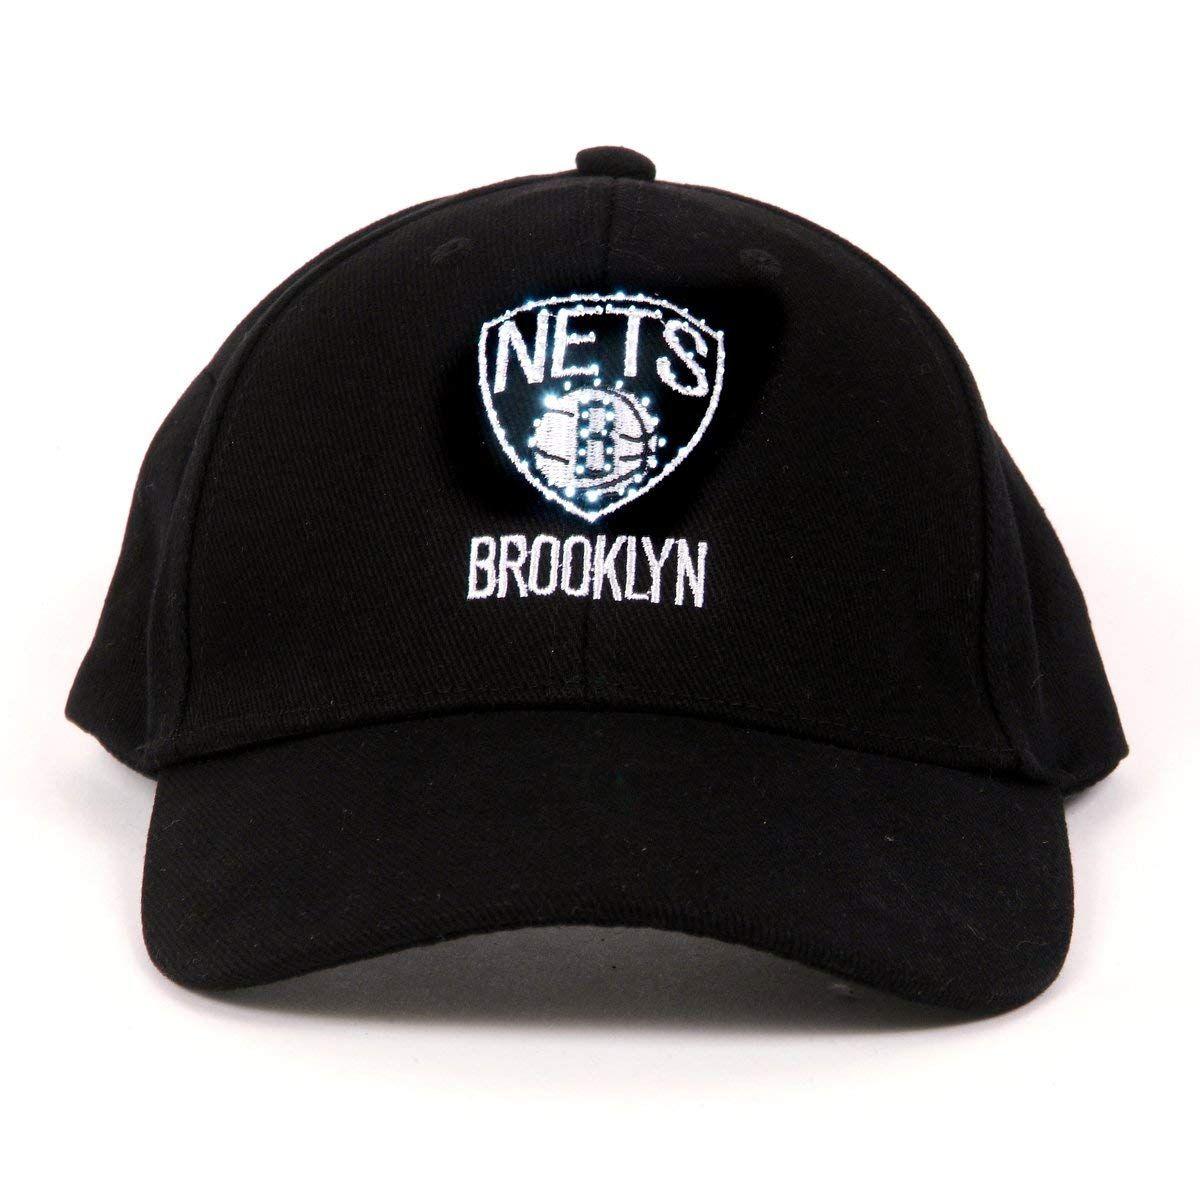 NBA Brooklyn Nets LED Light-Up Logo Adjustable Hat, $11.99 ...